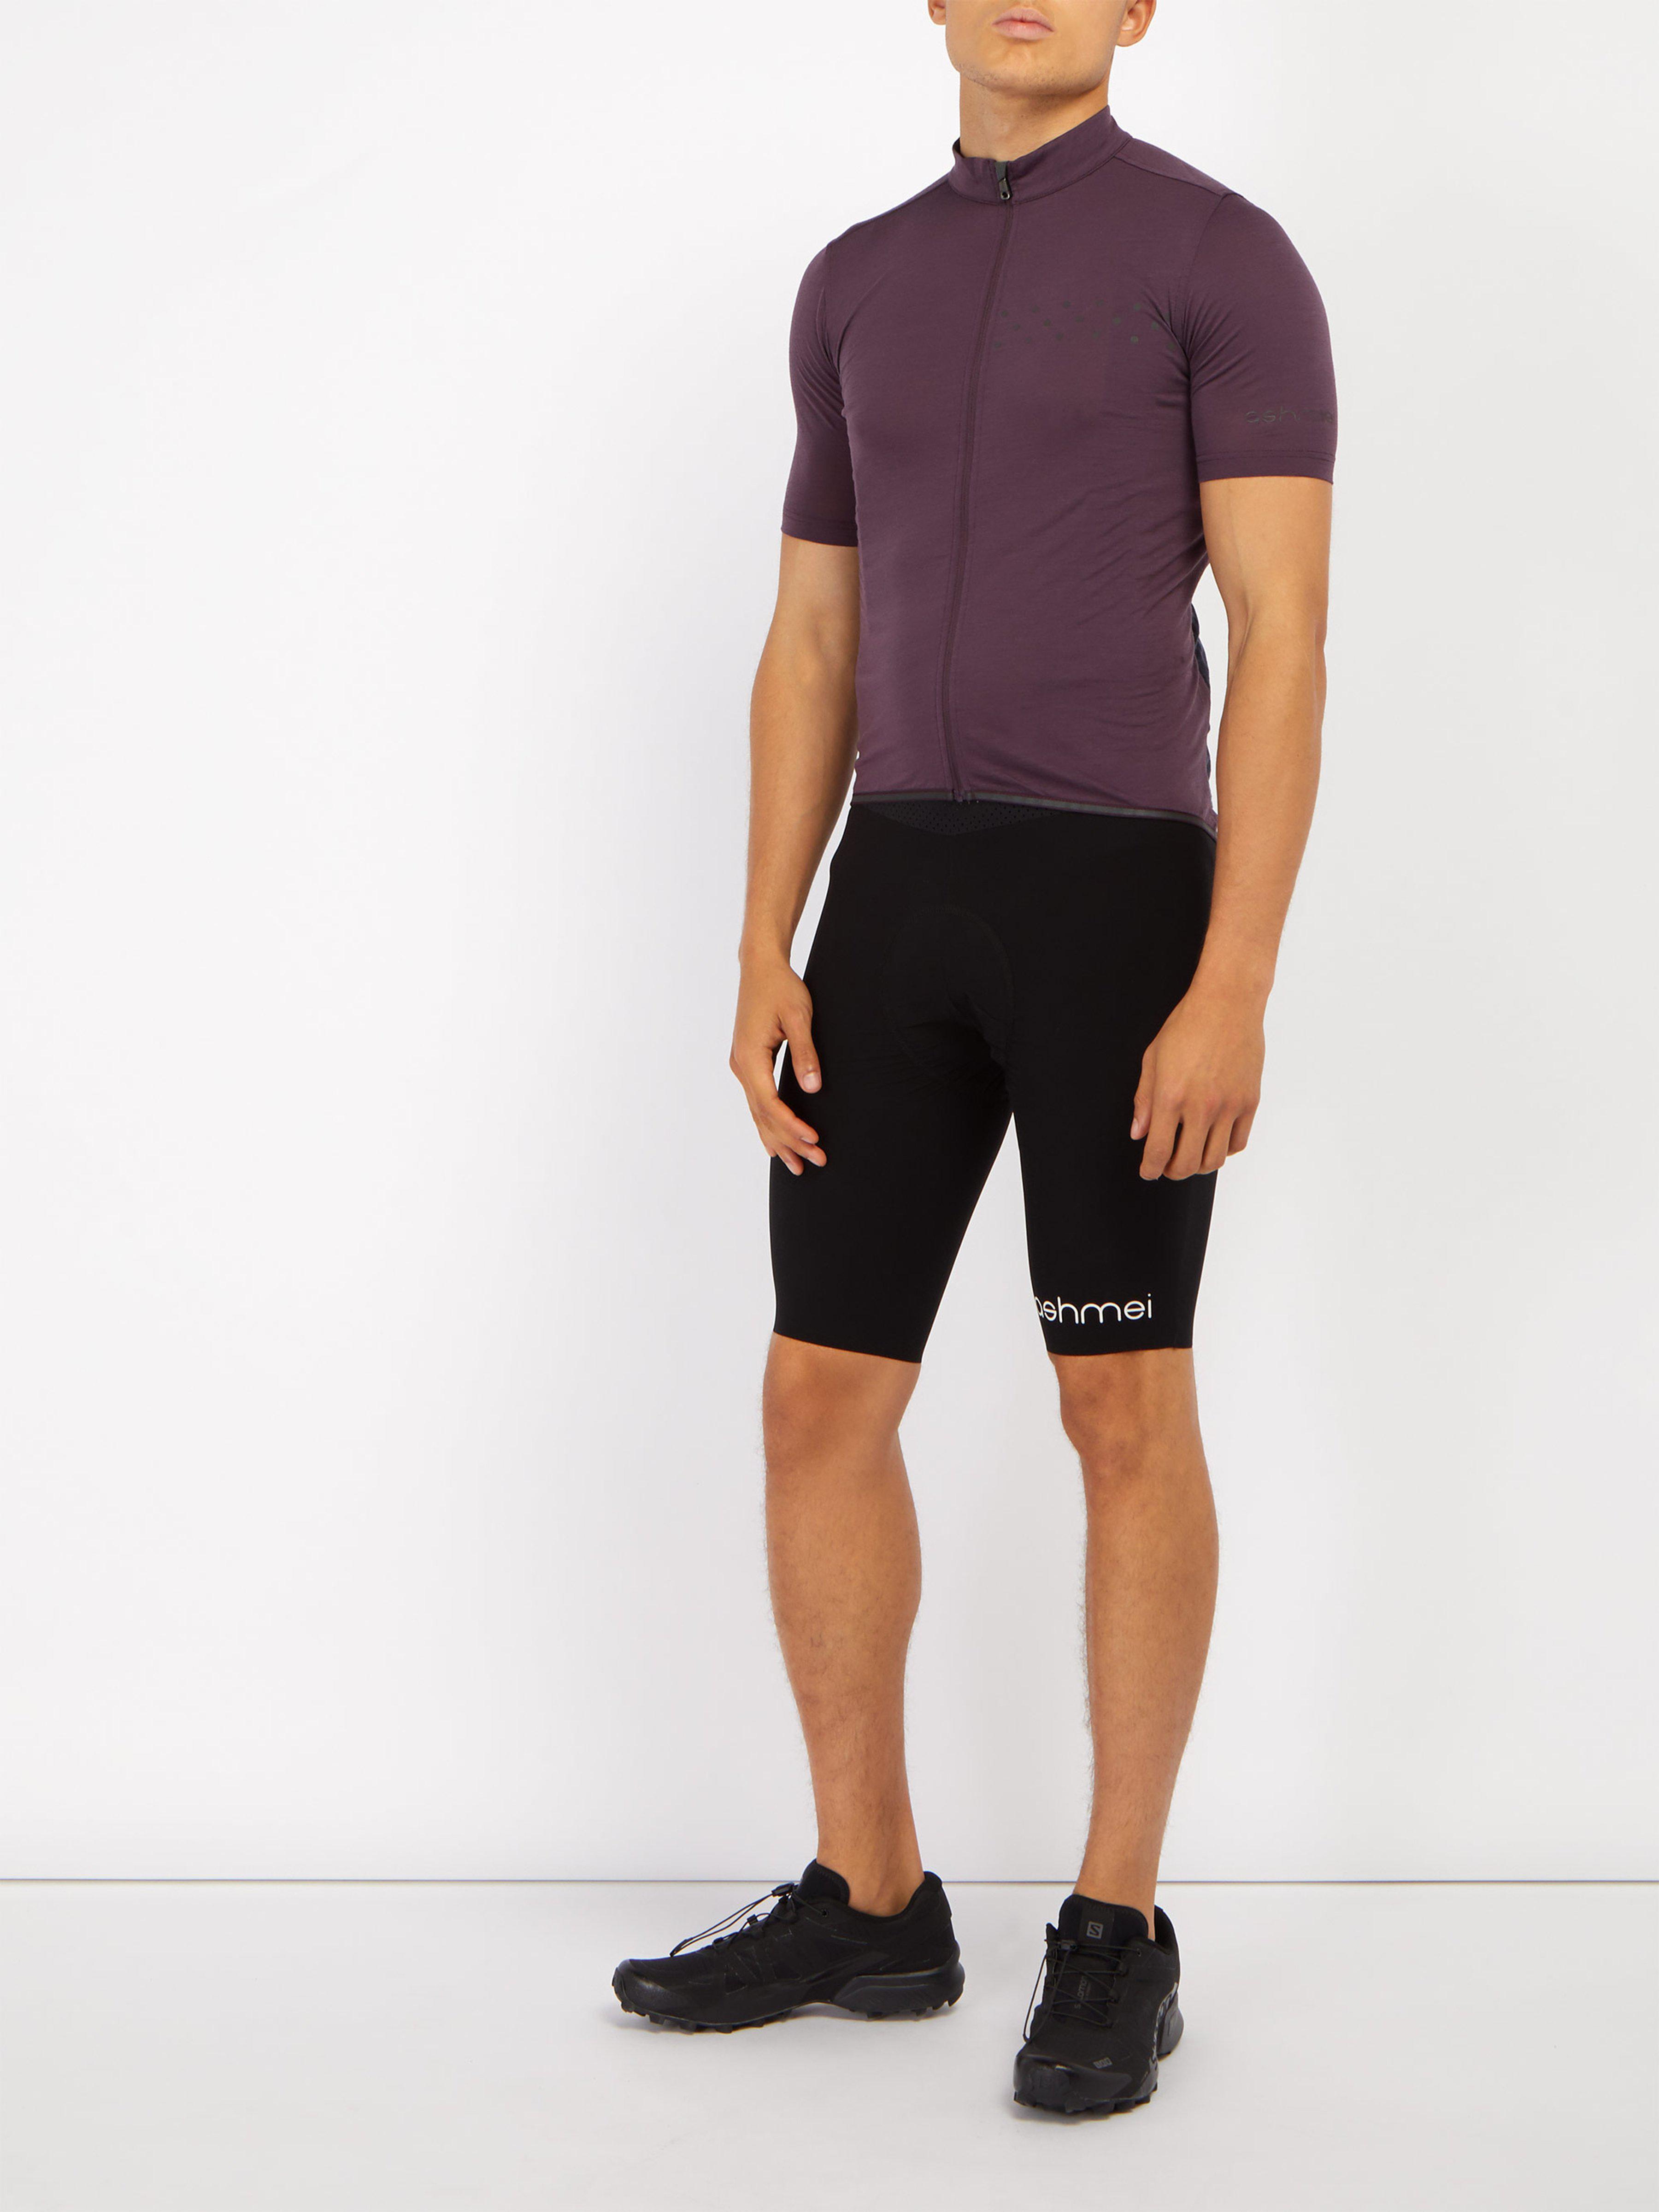 Ashmei - Purple Kom Merino Wool Blend Cycling Jersey for Men - Lyst. View  fullscreen c0fb61ff2